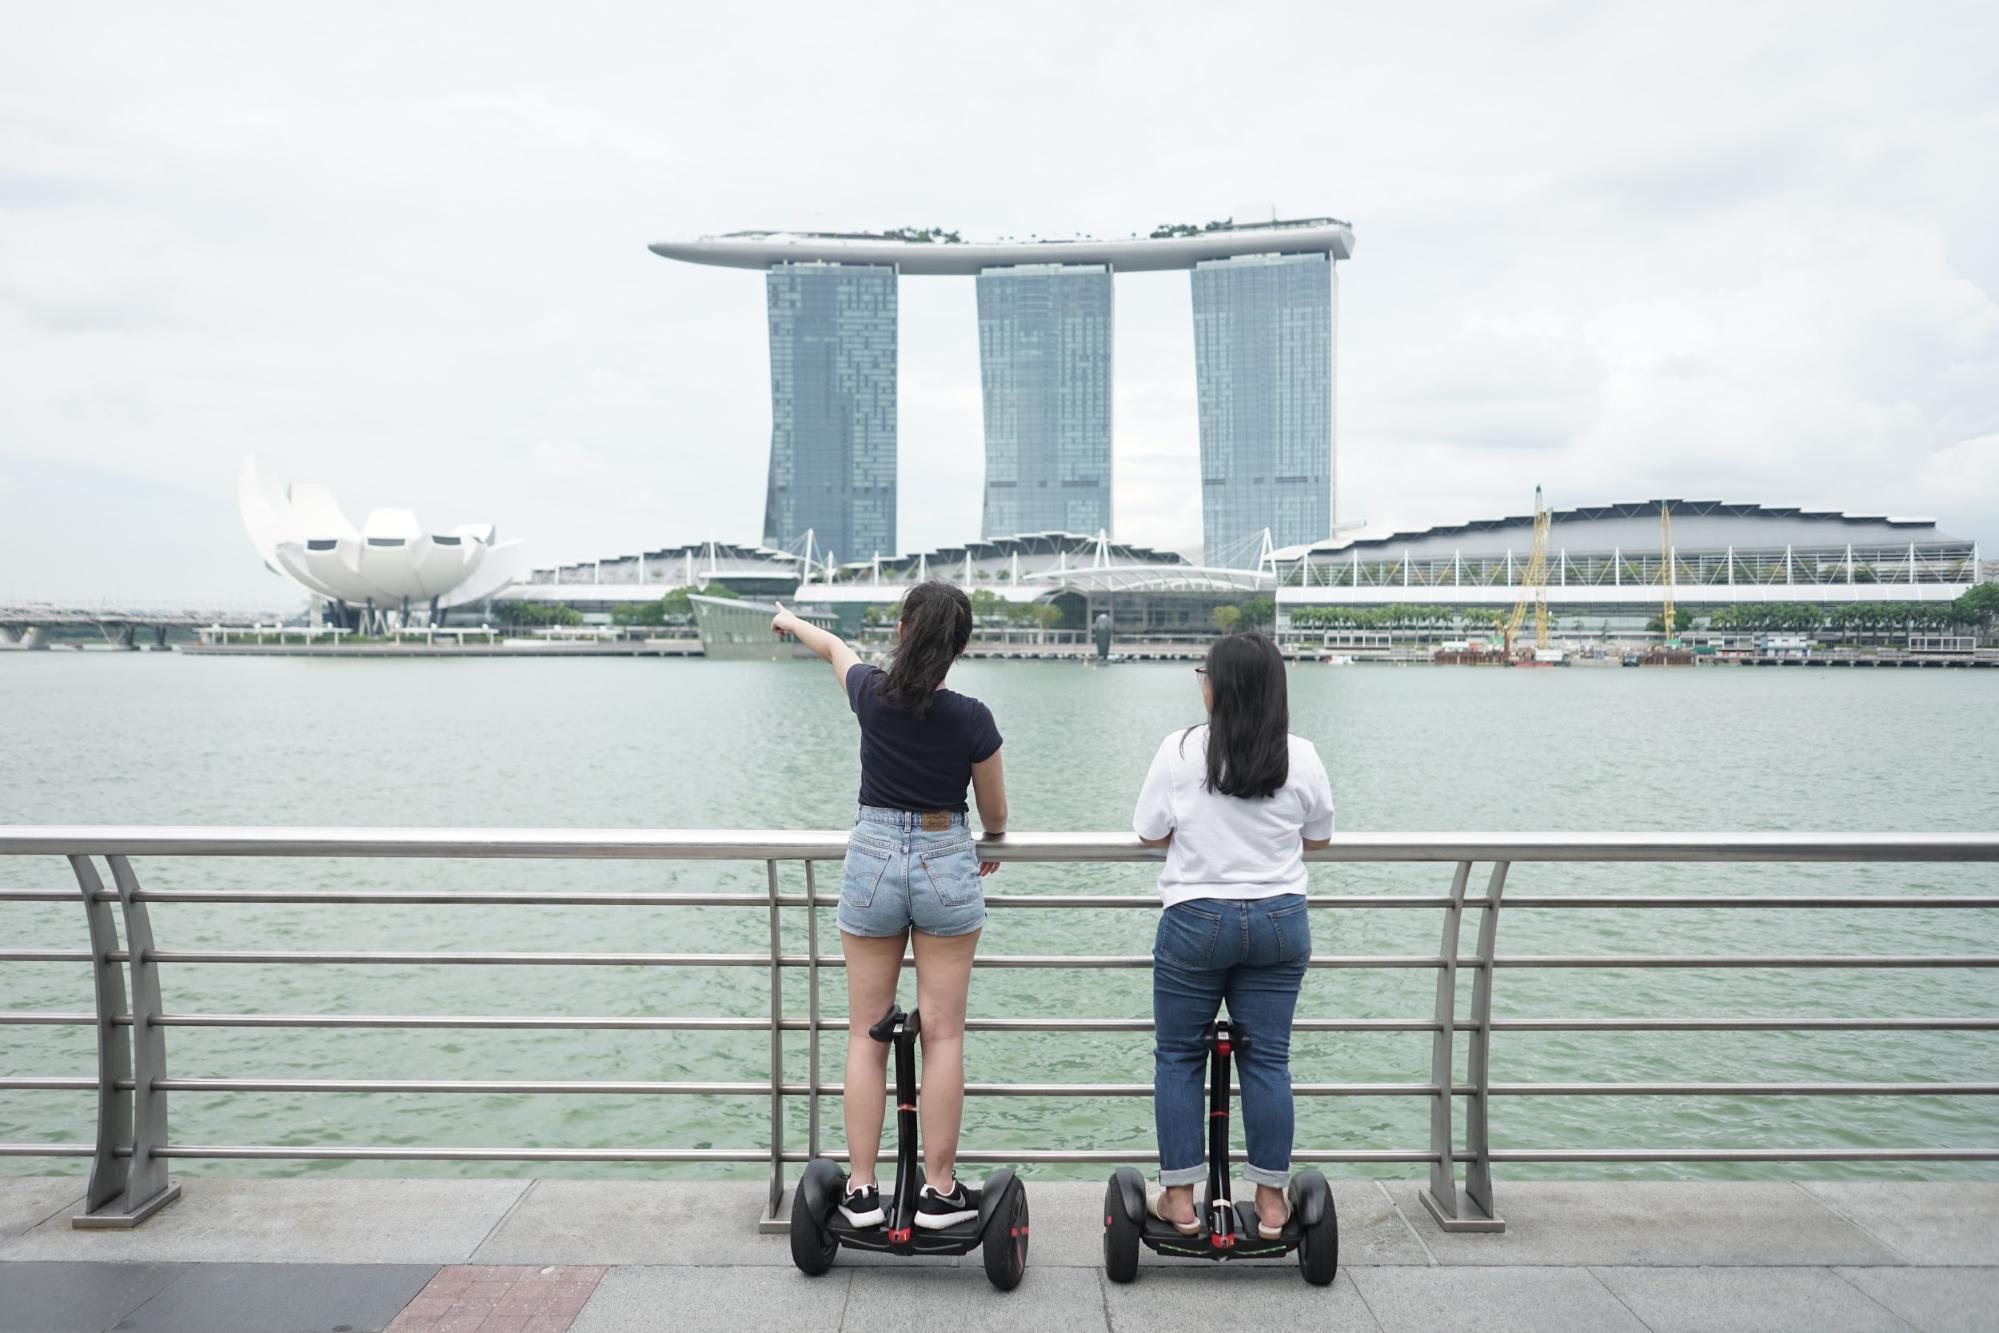 marina bay sands singapore 11 noi nhat dinh phai den24